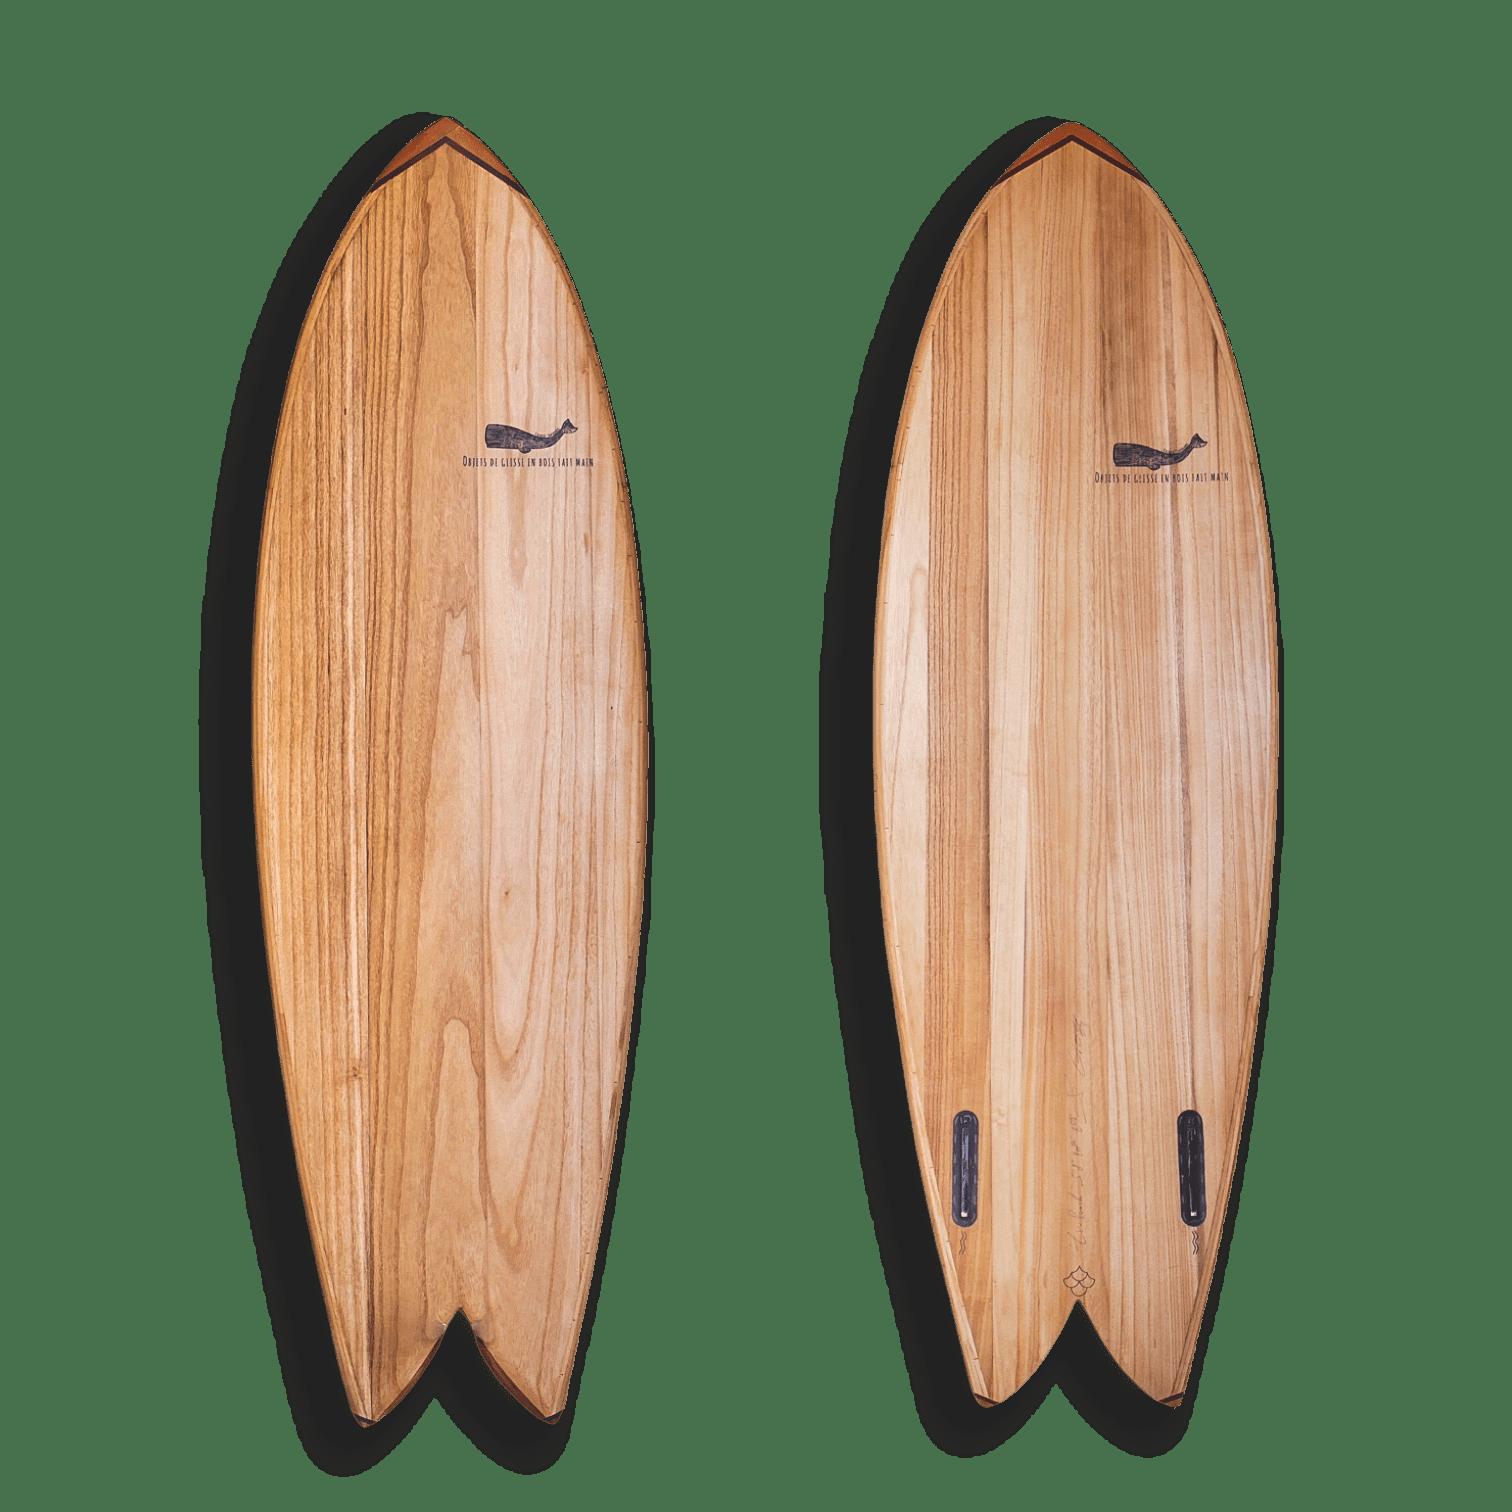 cachalot surfboards paulownia planche surf handmade artisan shaper hollow bois scorbut